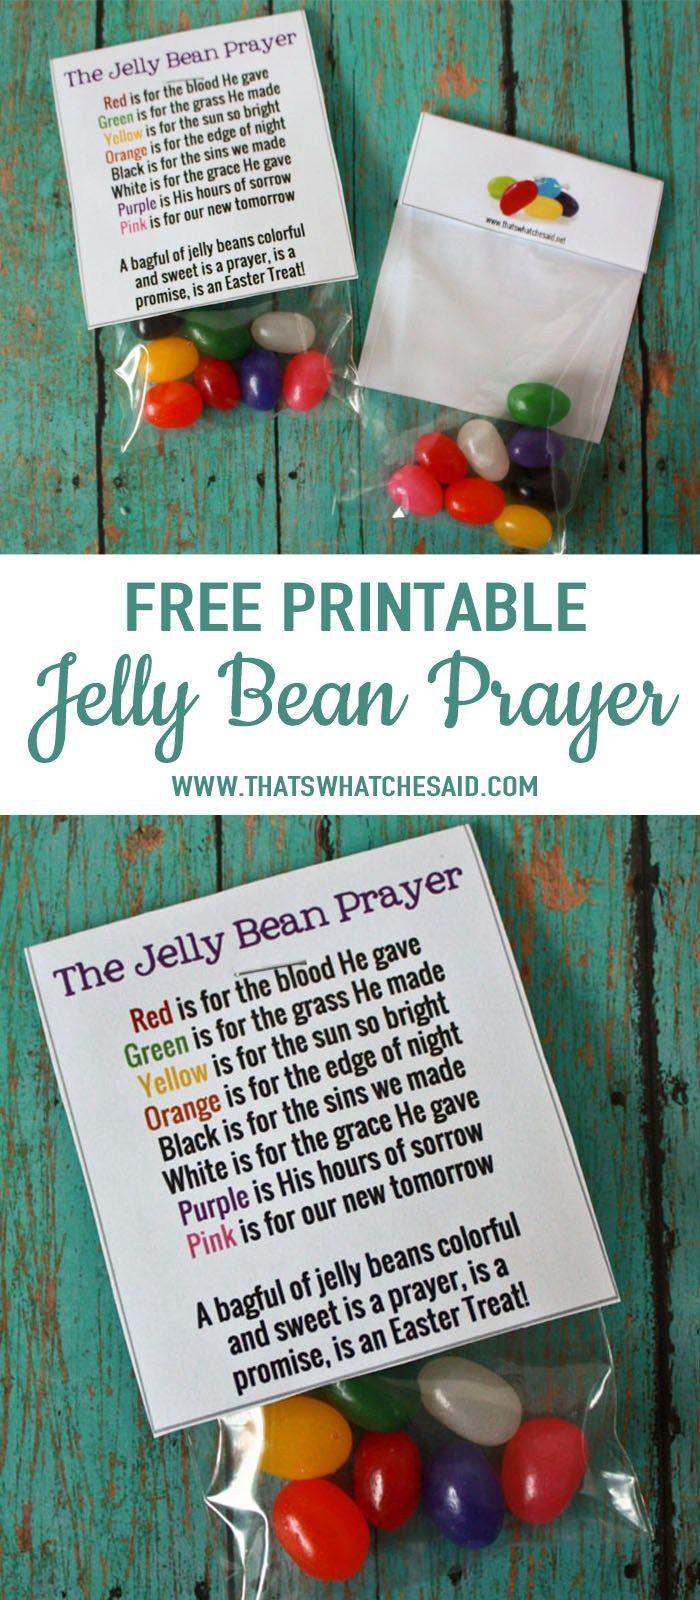 Free Jelly Bean Prayer Printable Treat Topper | As Seen On - Free Printable Easter Sermons